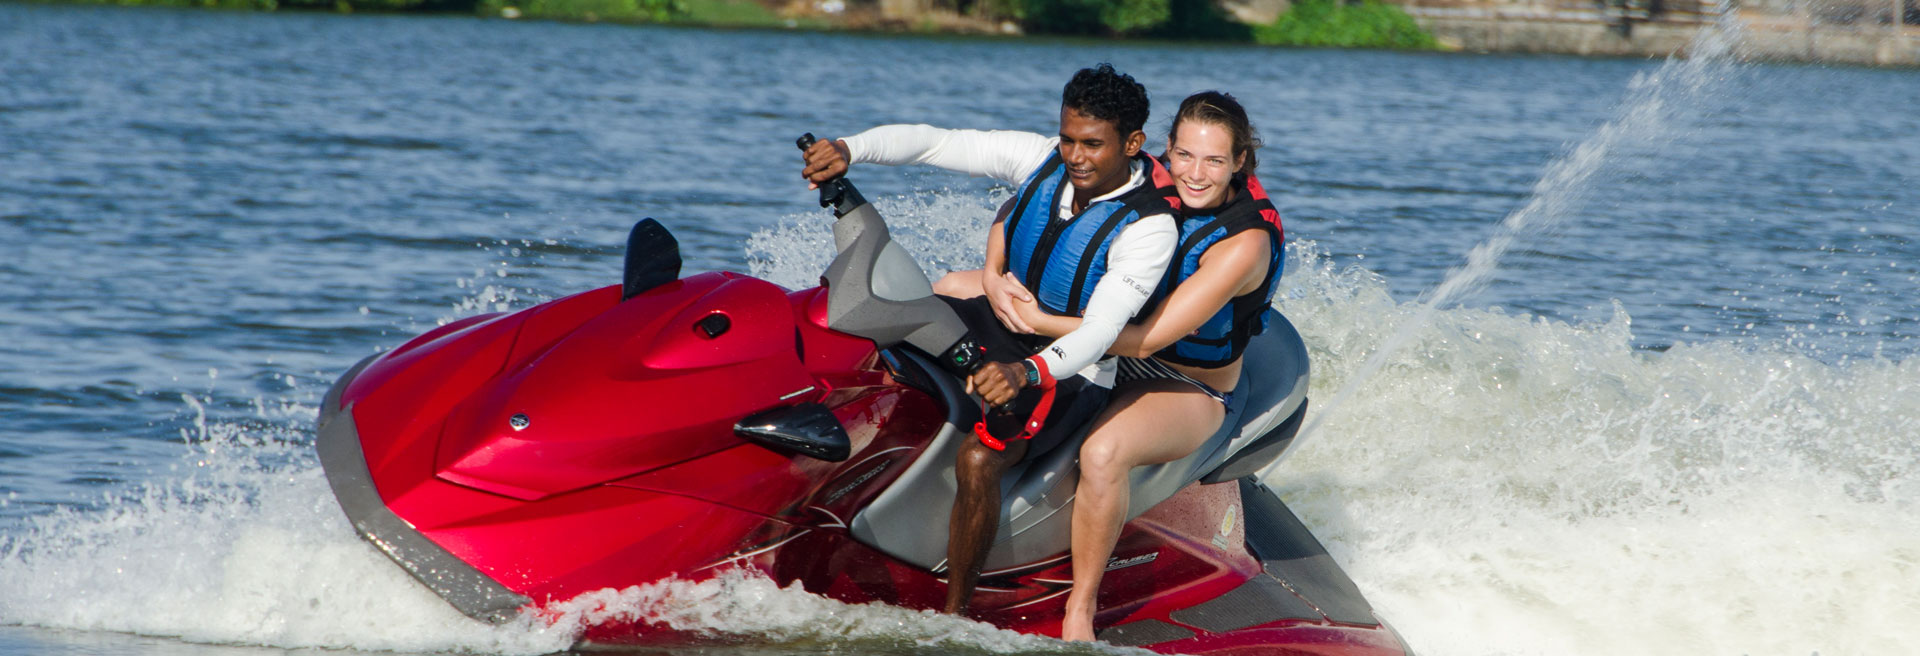 couple jet skiing on the negombo lagoon